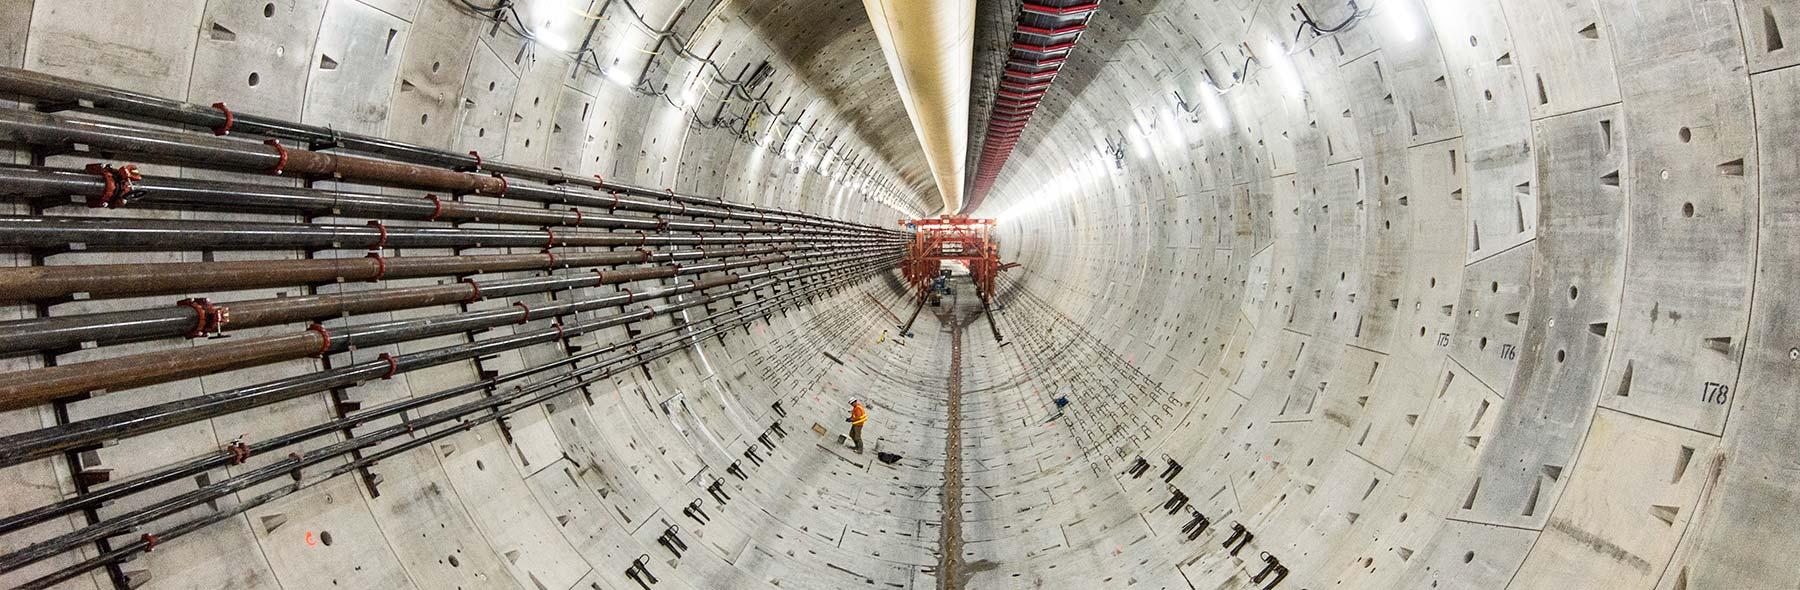 SR-99 Tunnel - Glumac Building Commissioning